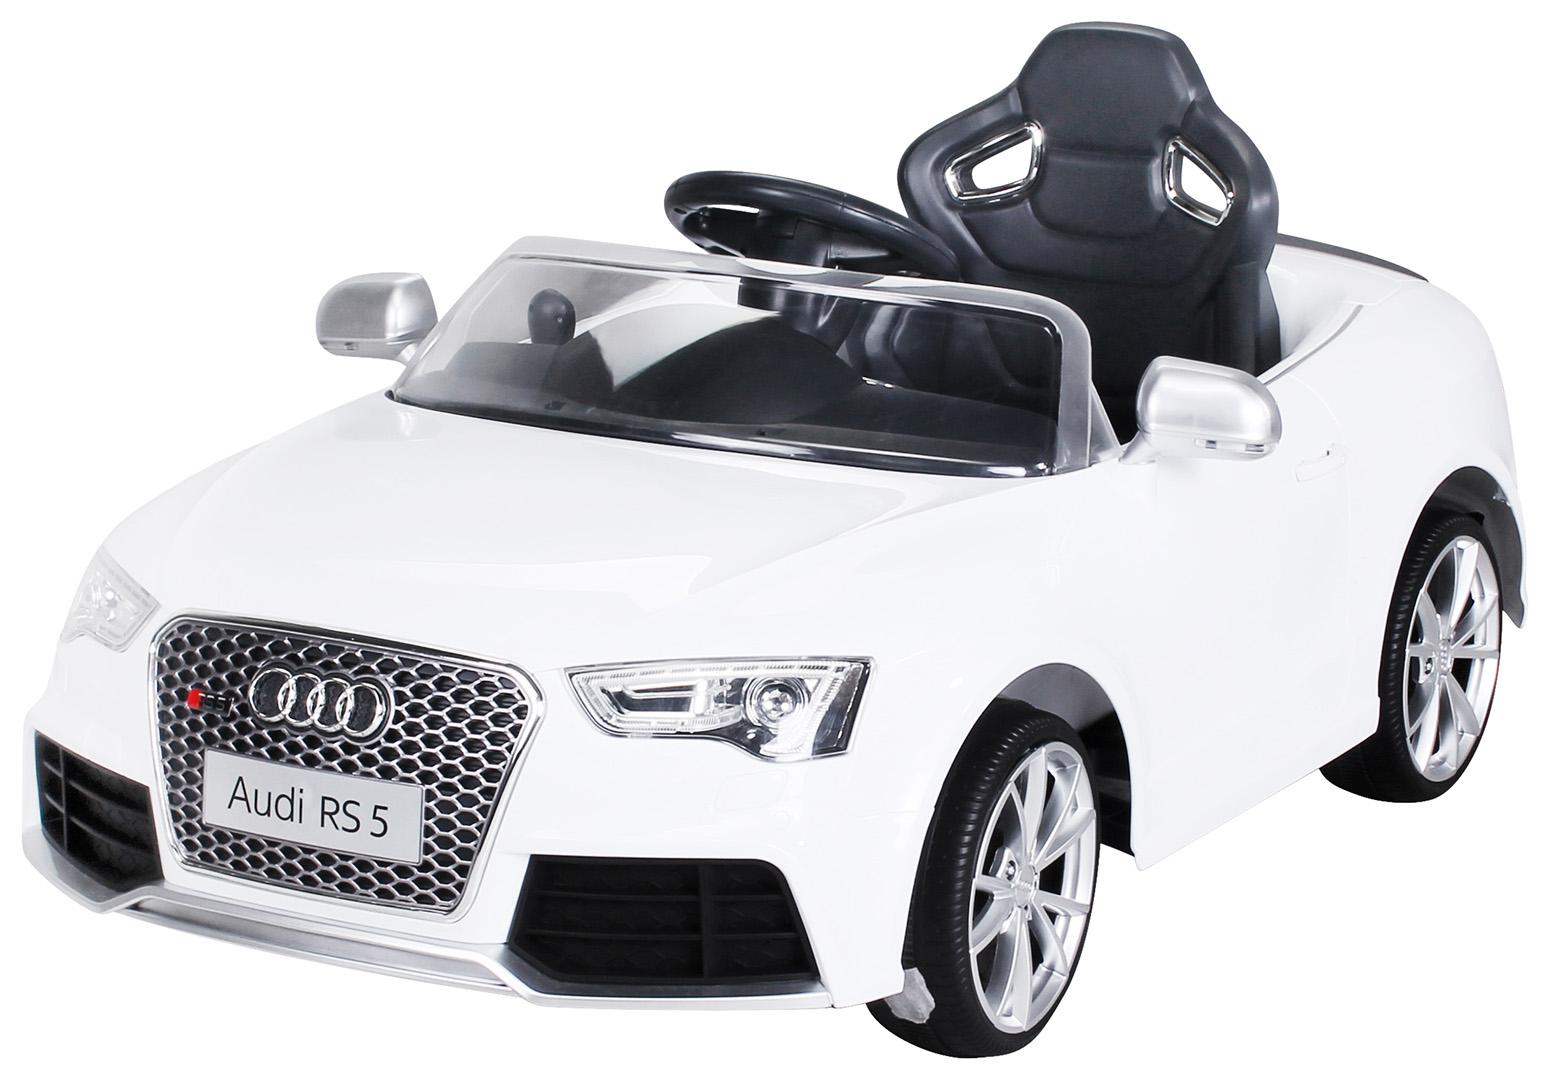 luxus kinder elektroauto audi s5 cabriolet lizenziert. Black Bedroom Furniture Sets. Home Design Ideas